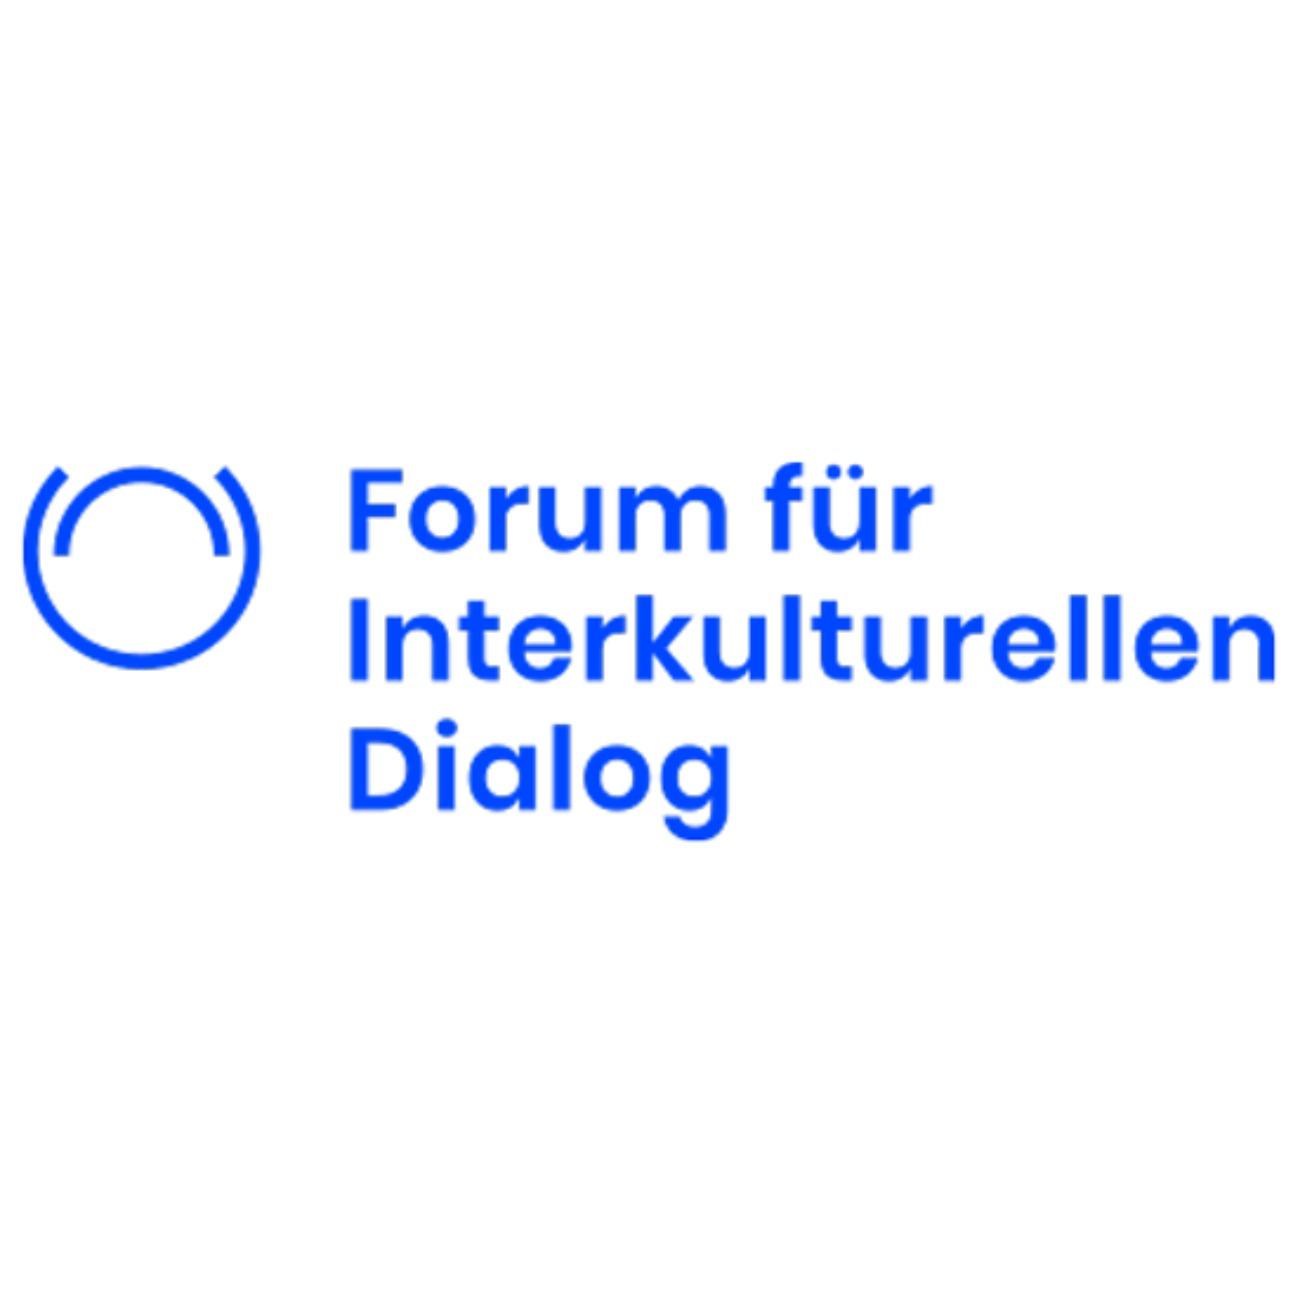 forum fur interkulturellen dialog logo